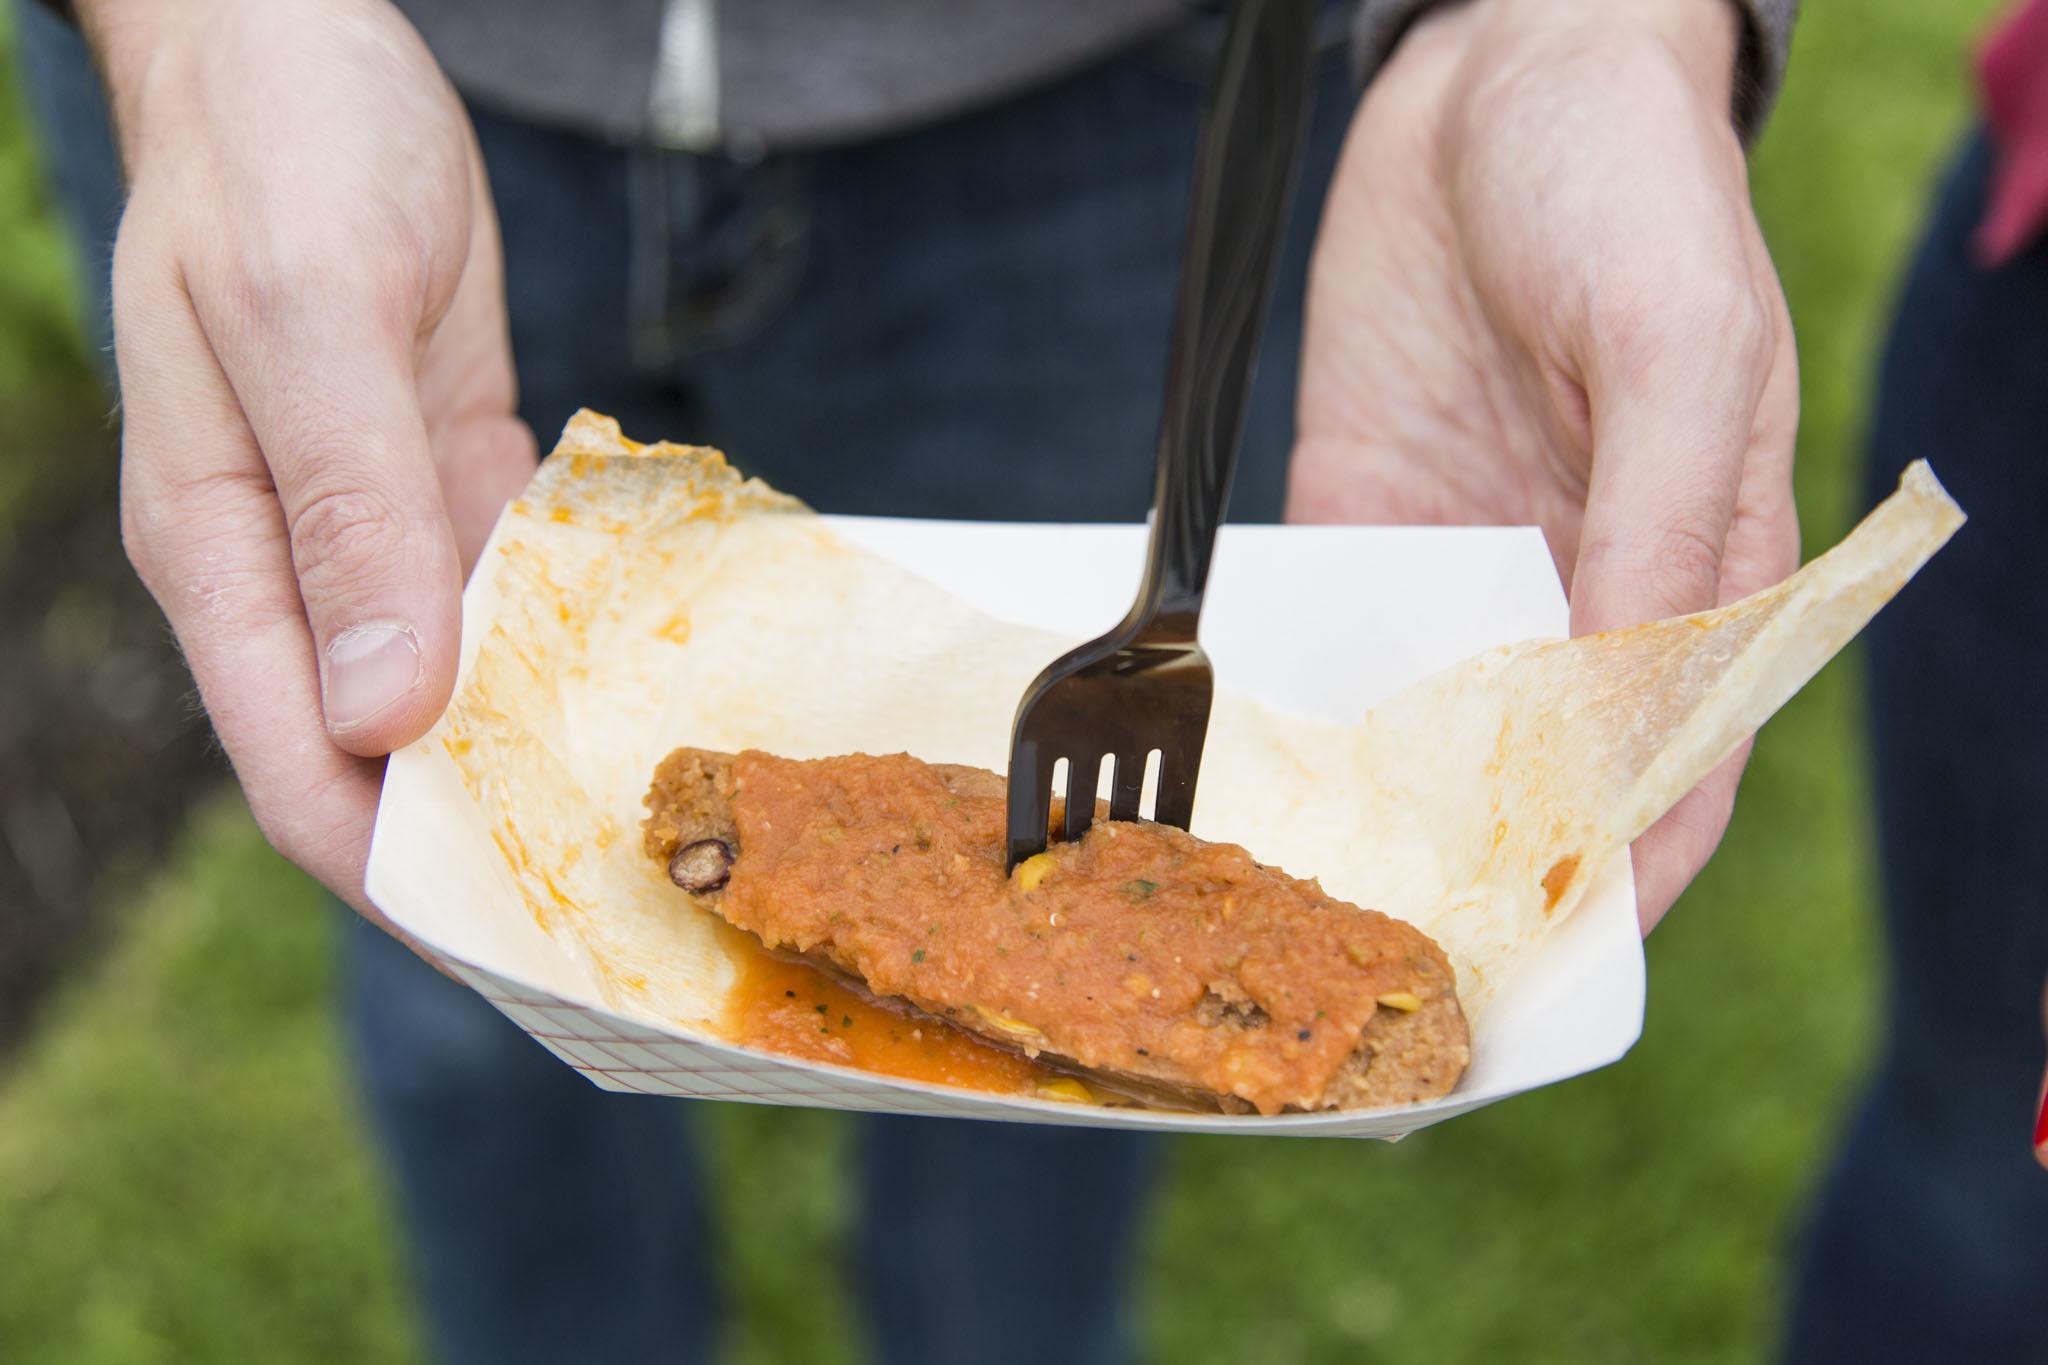 Spicy Black Bean & Corn Tamale from Dia de los Tamales